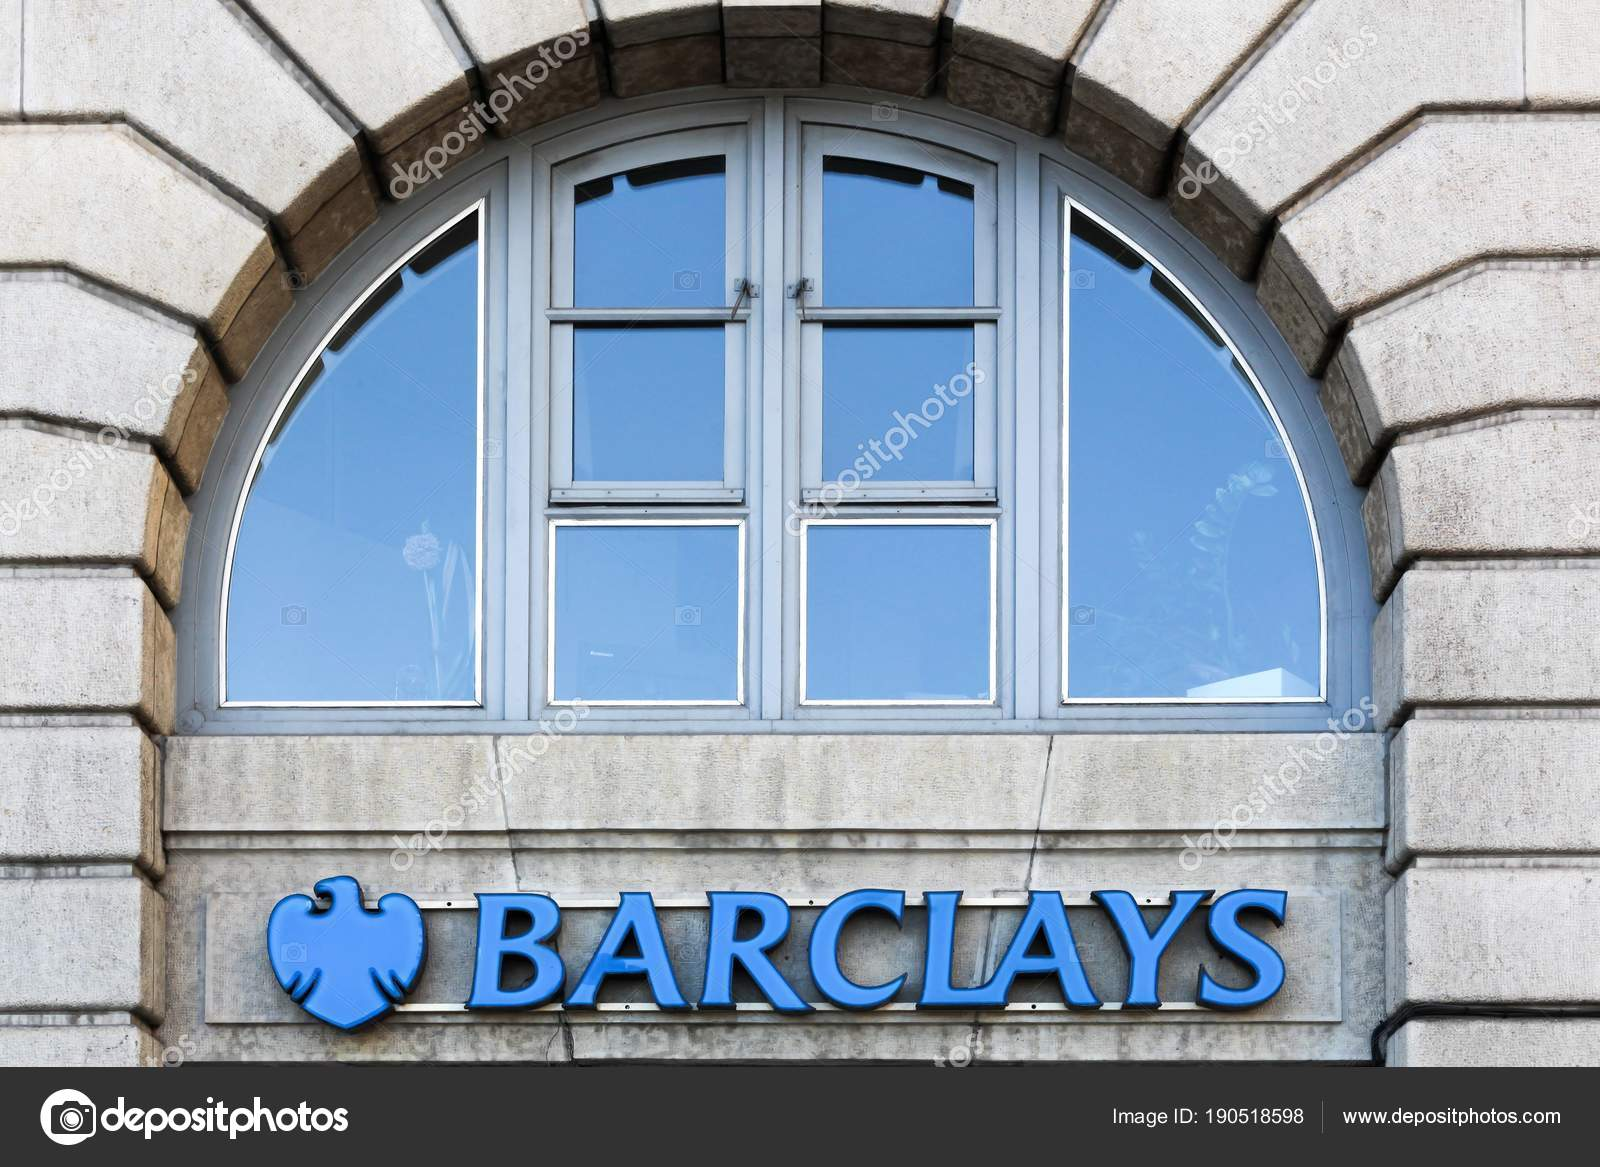 Lyon France August 2016 Barclays Bank Logo Wall Barclays